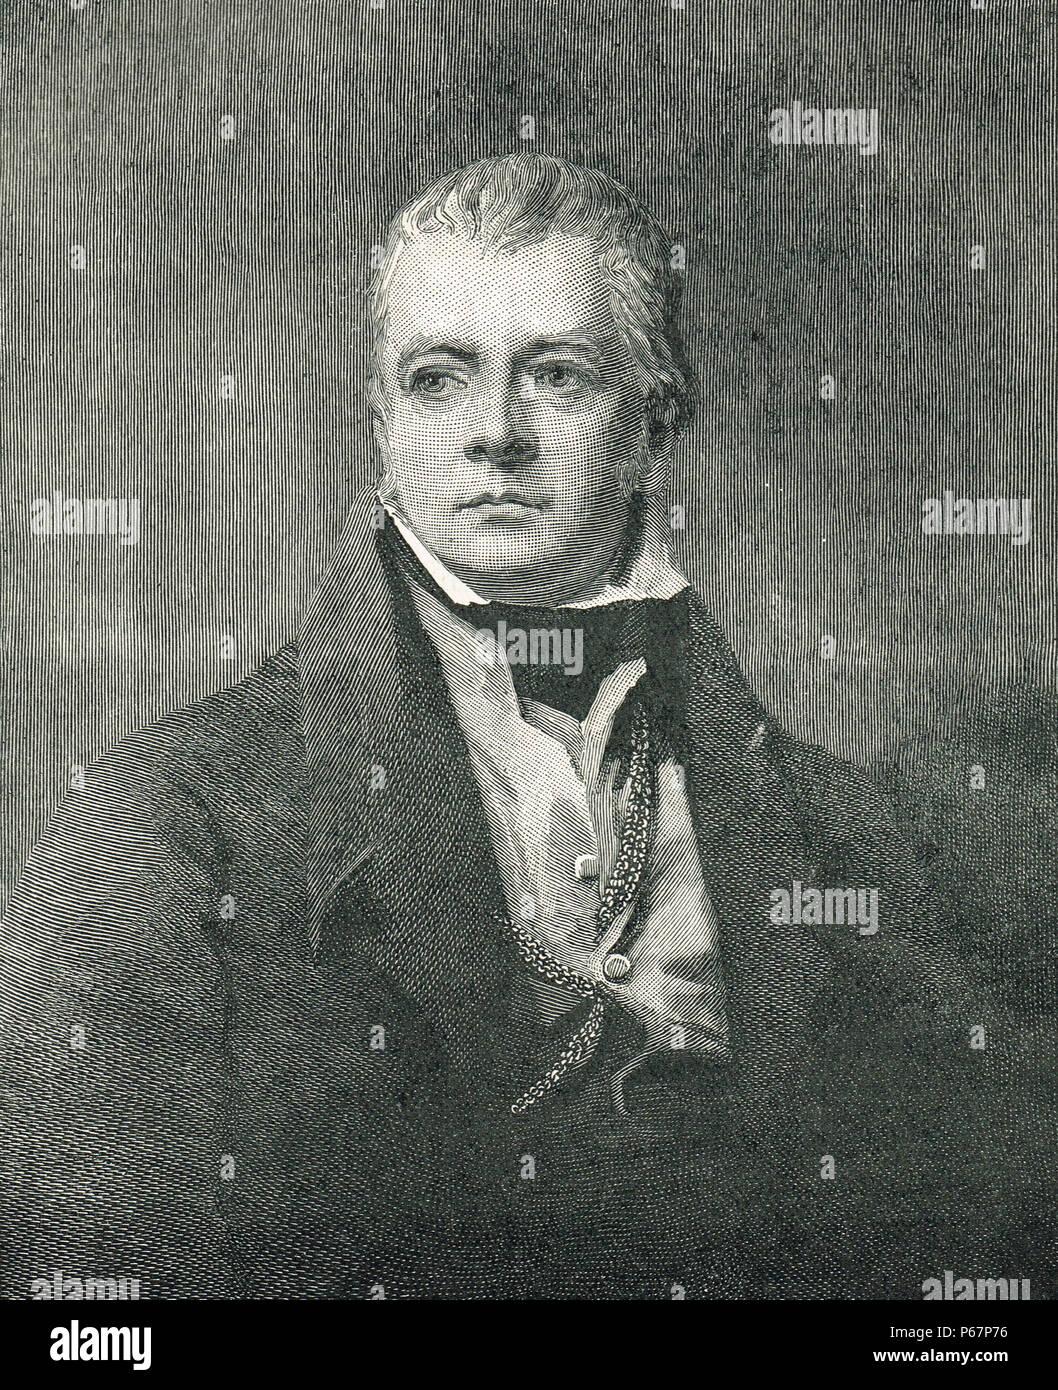 Sir Walter Scott, 19th century, novelist, author of Historical Romance novels - Stock Image